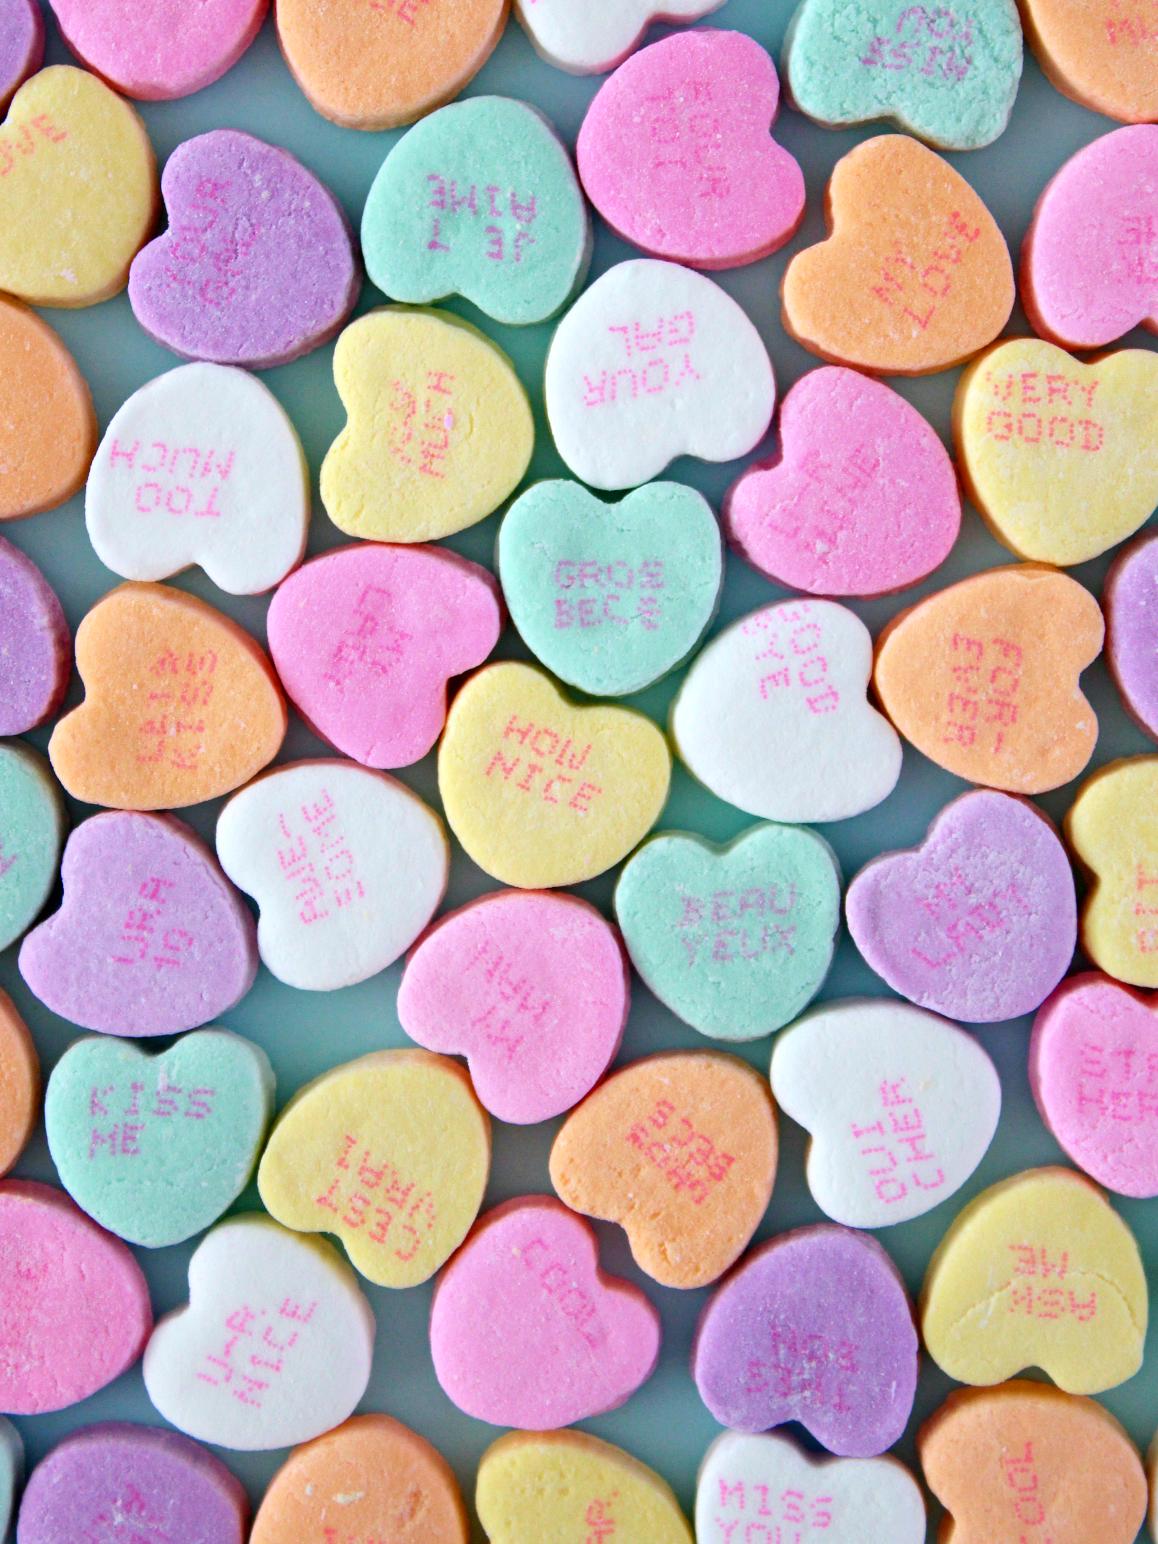 10 CONVERSATION HEARTS CRAFTS FOR VALENTINE'S